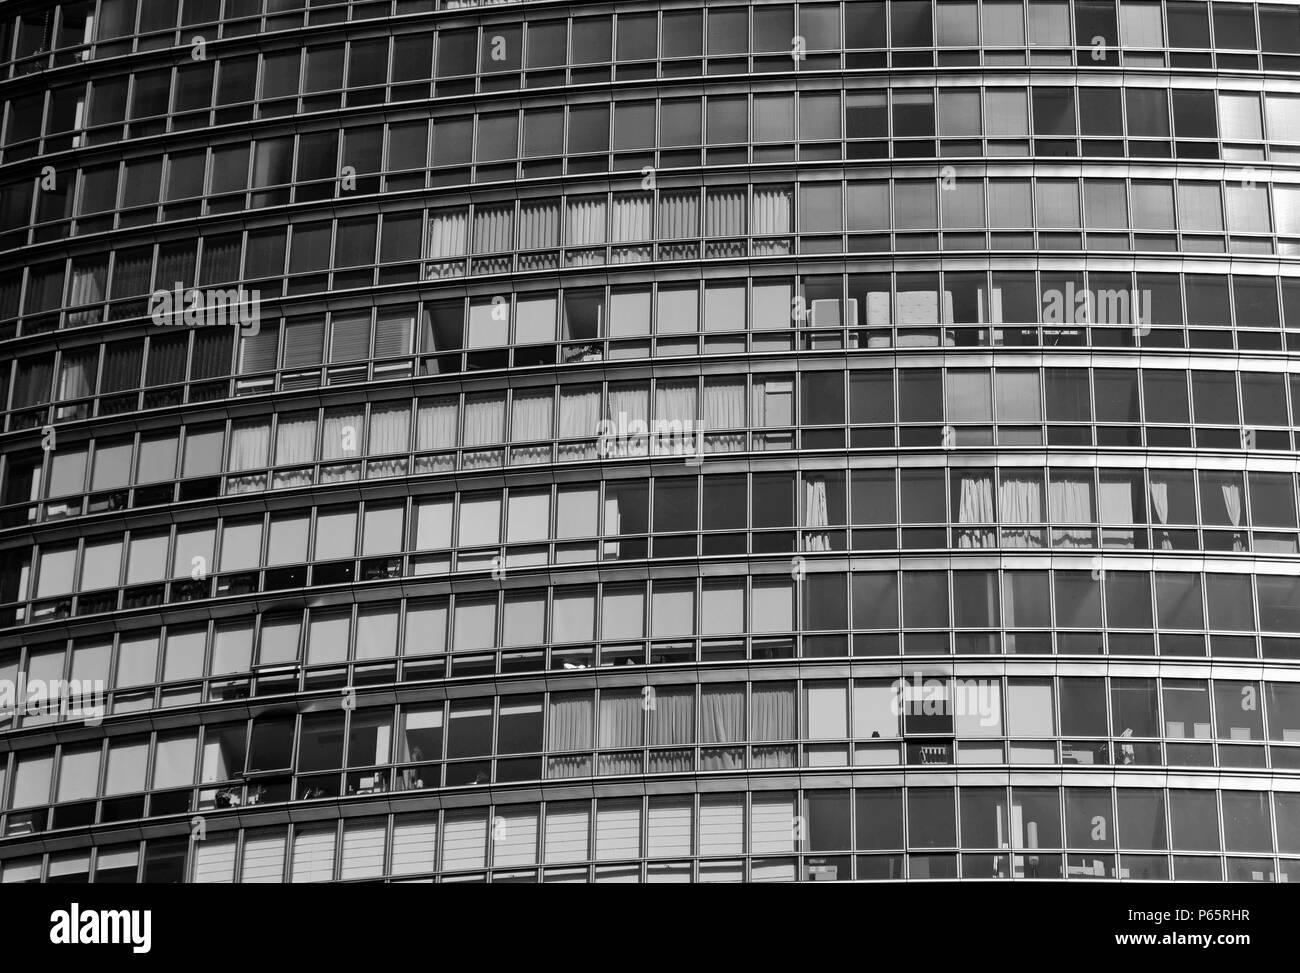 Marriott Executive Apartments, London Docklands, England, UK - Stock Image